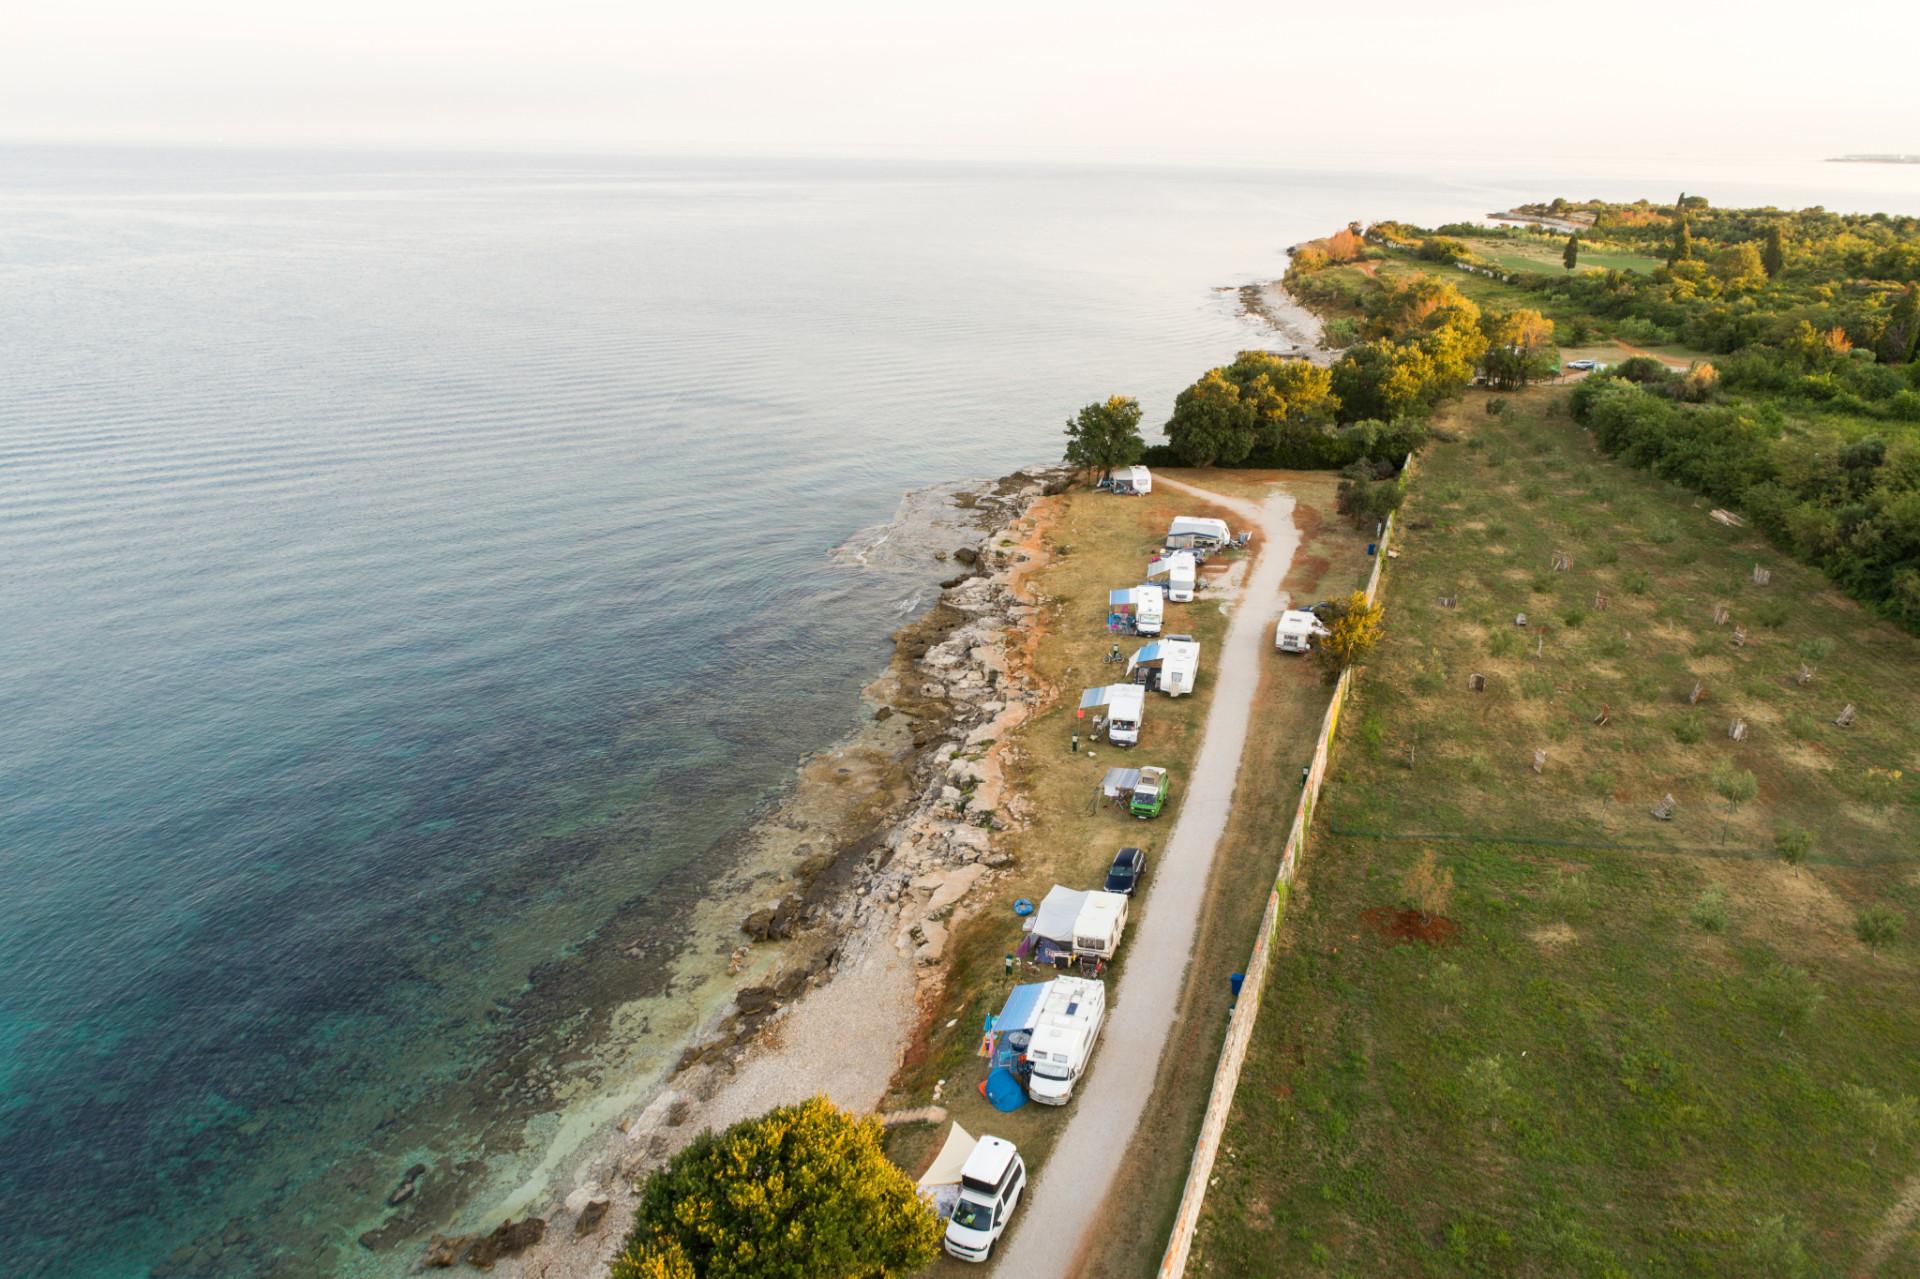 Campingplatz nahe Novigrad in Istrien